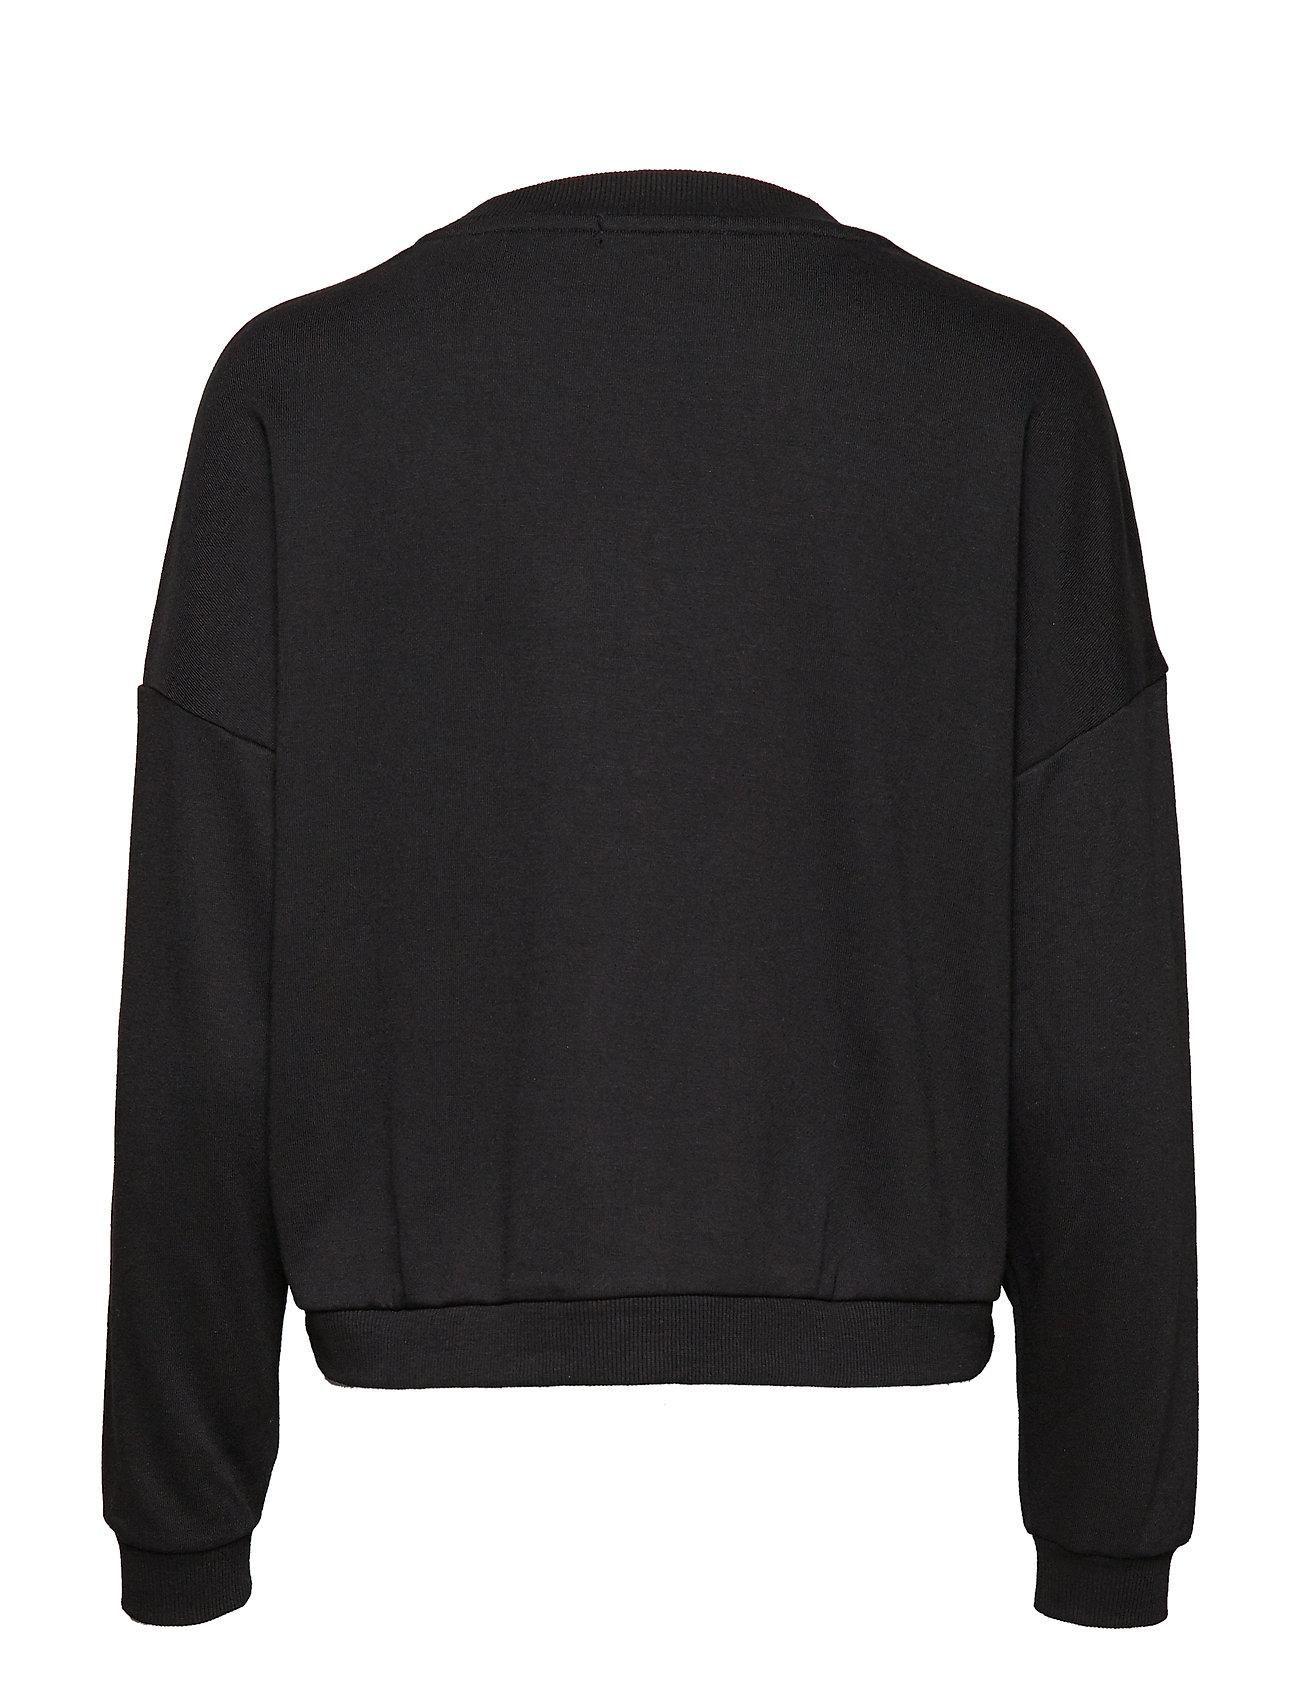 Iconic Jeans BurnoutGuess Fleecejet Black Black Fleecejet Iconic IWE2YDH9e